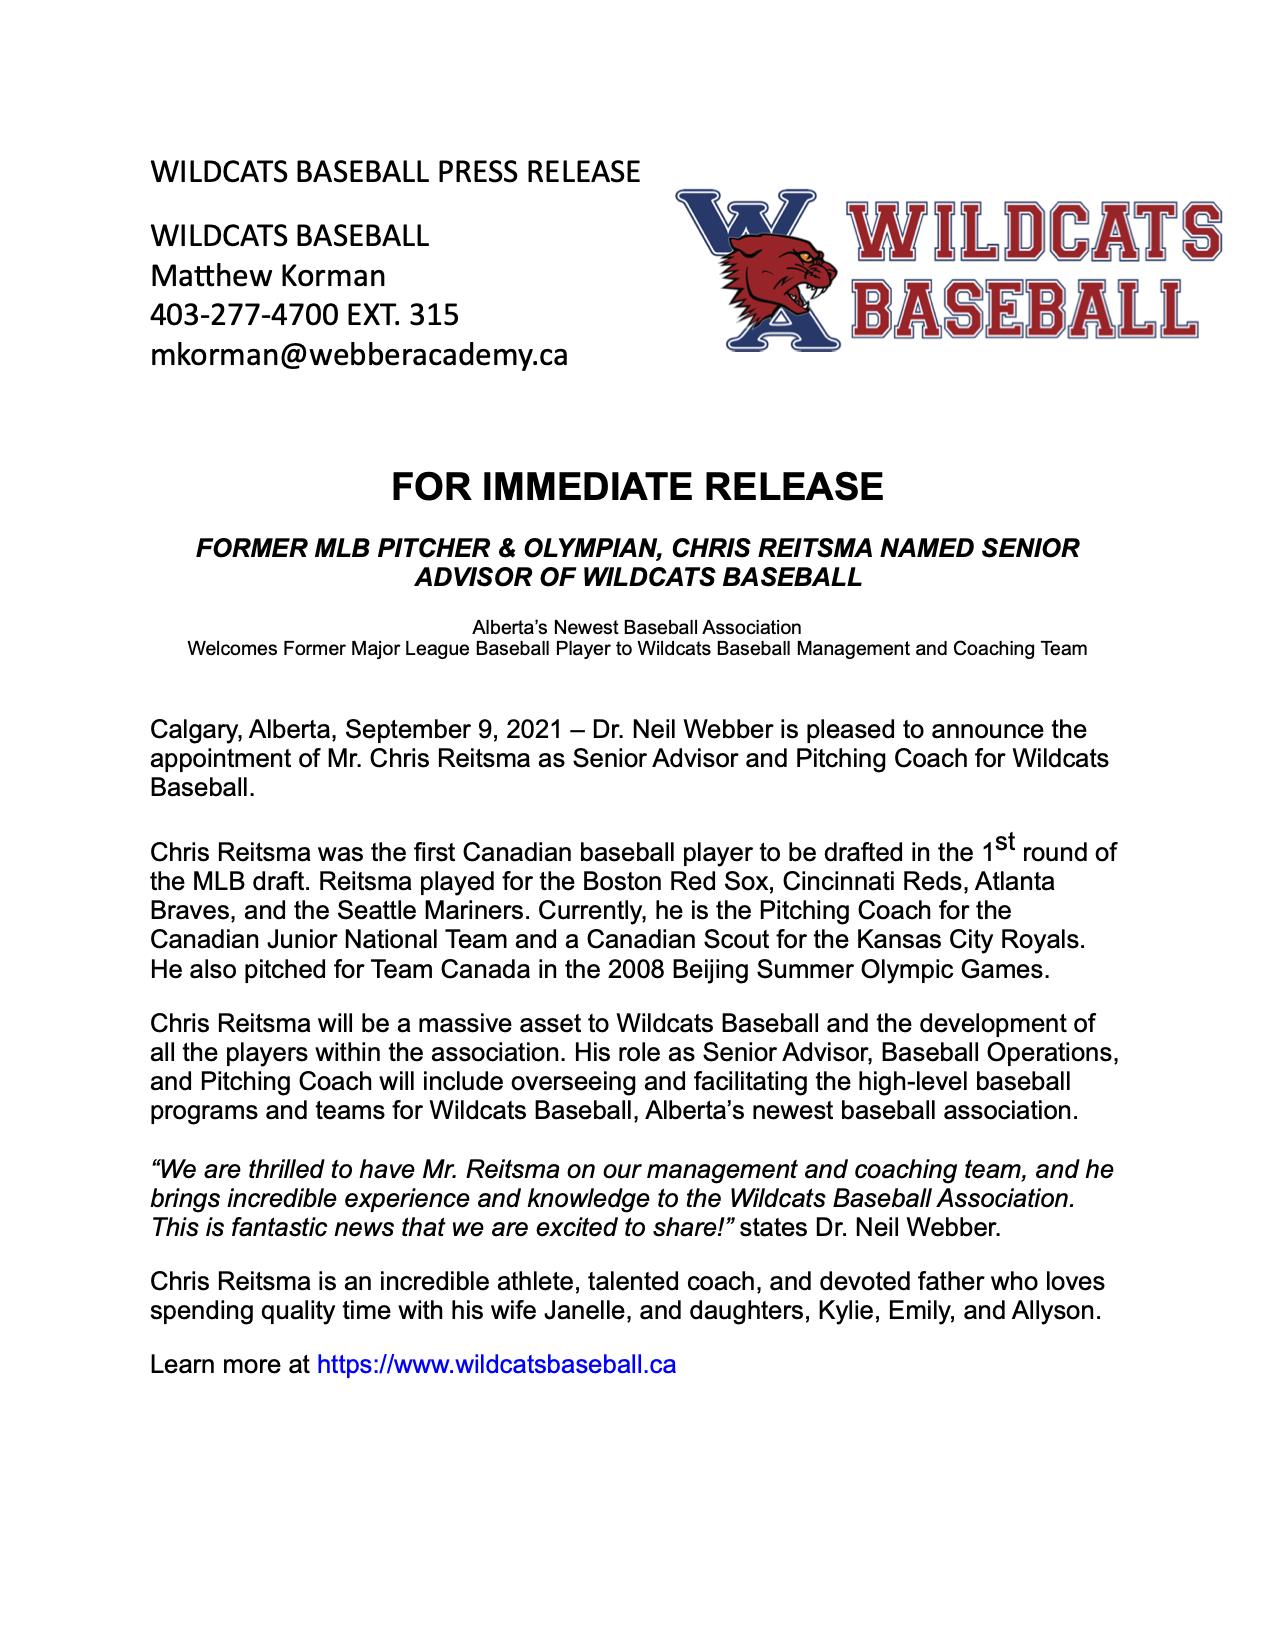 Chris Reitsma Press Release Wildcats Baseball (1)